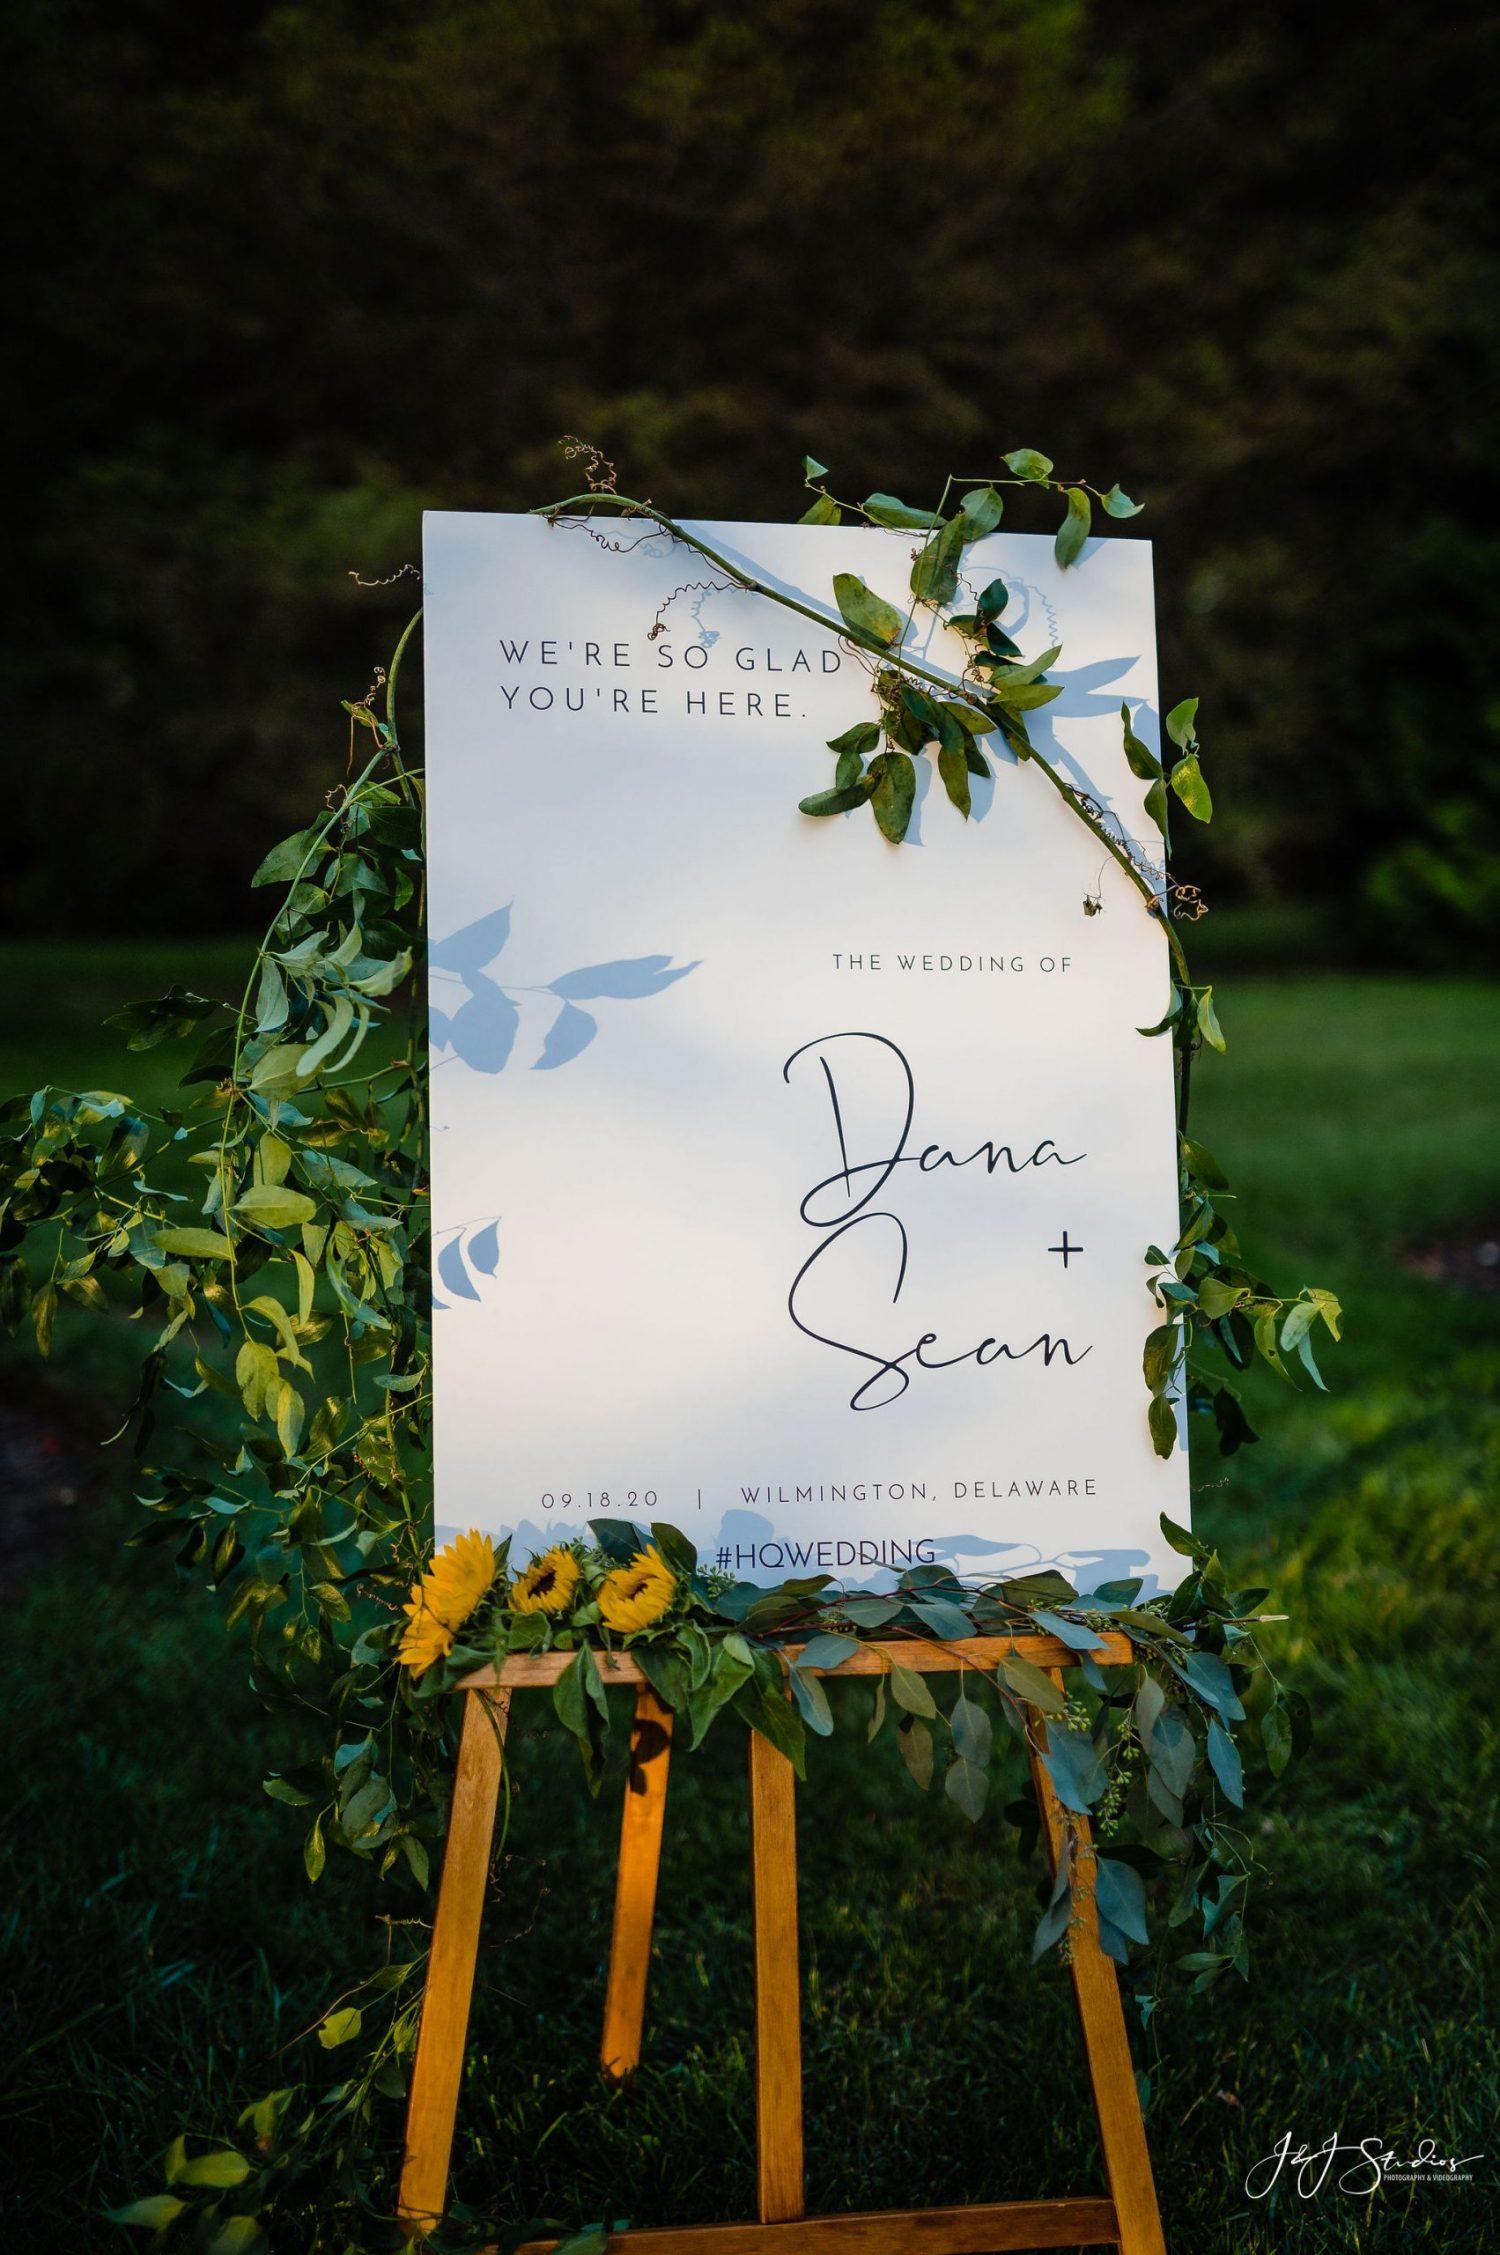 wedding ceremony sign Dana and Sean